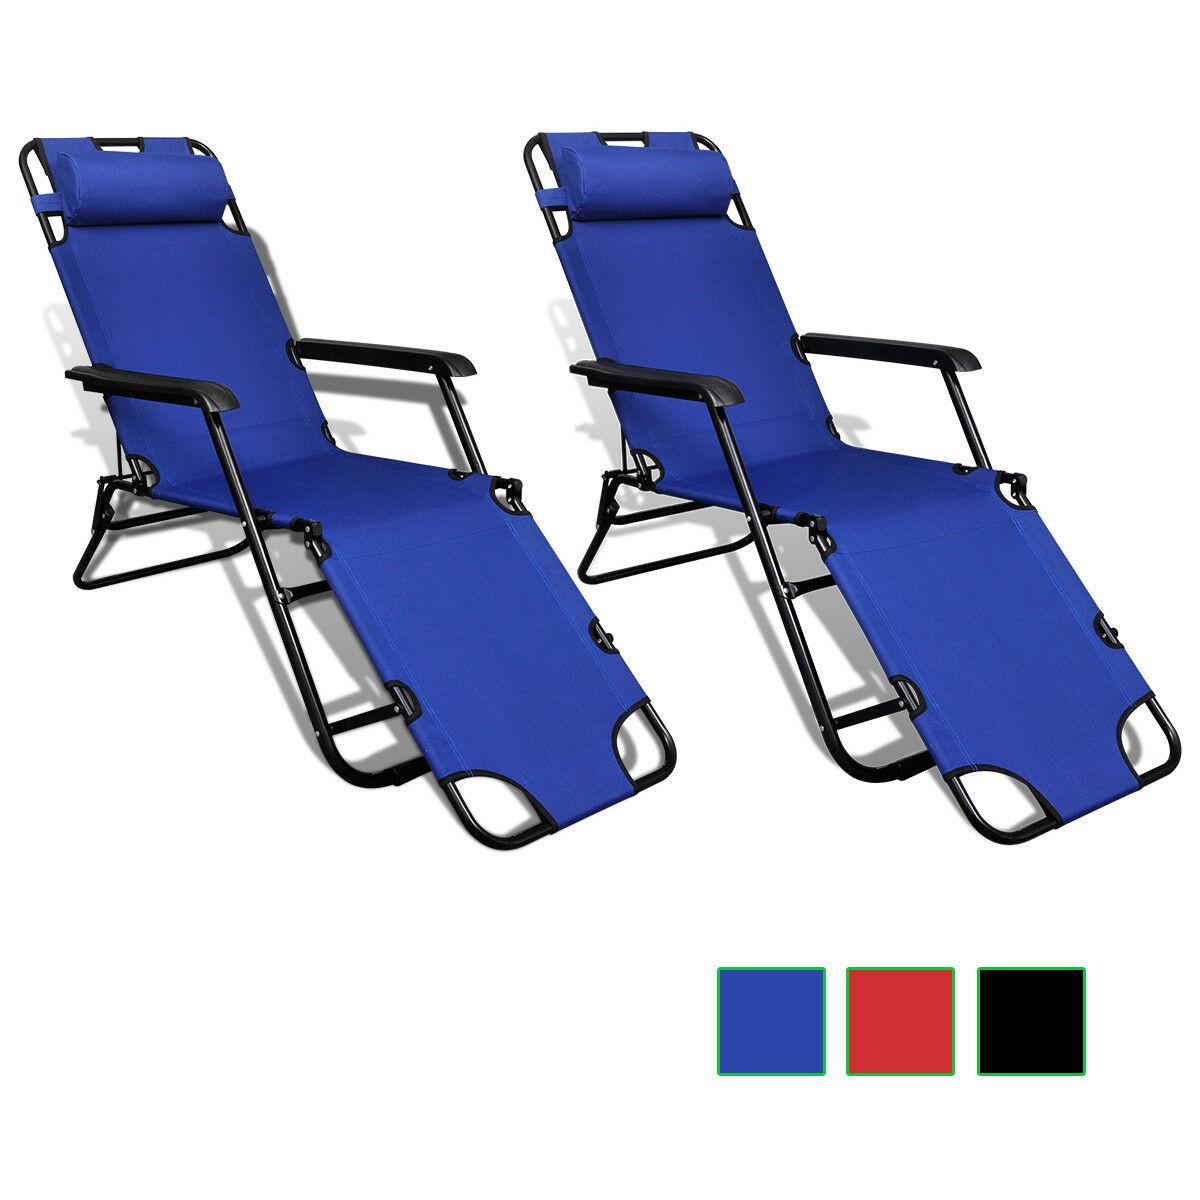 vidaXL 2x Folding Sun Loungers Reclining Chairs 3 Positions Sunbeds 3 Colors